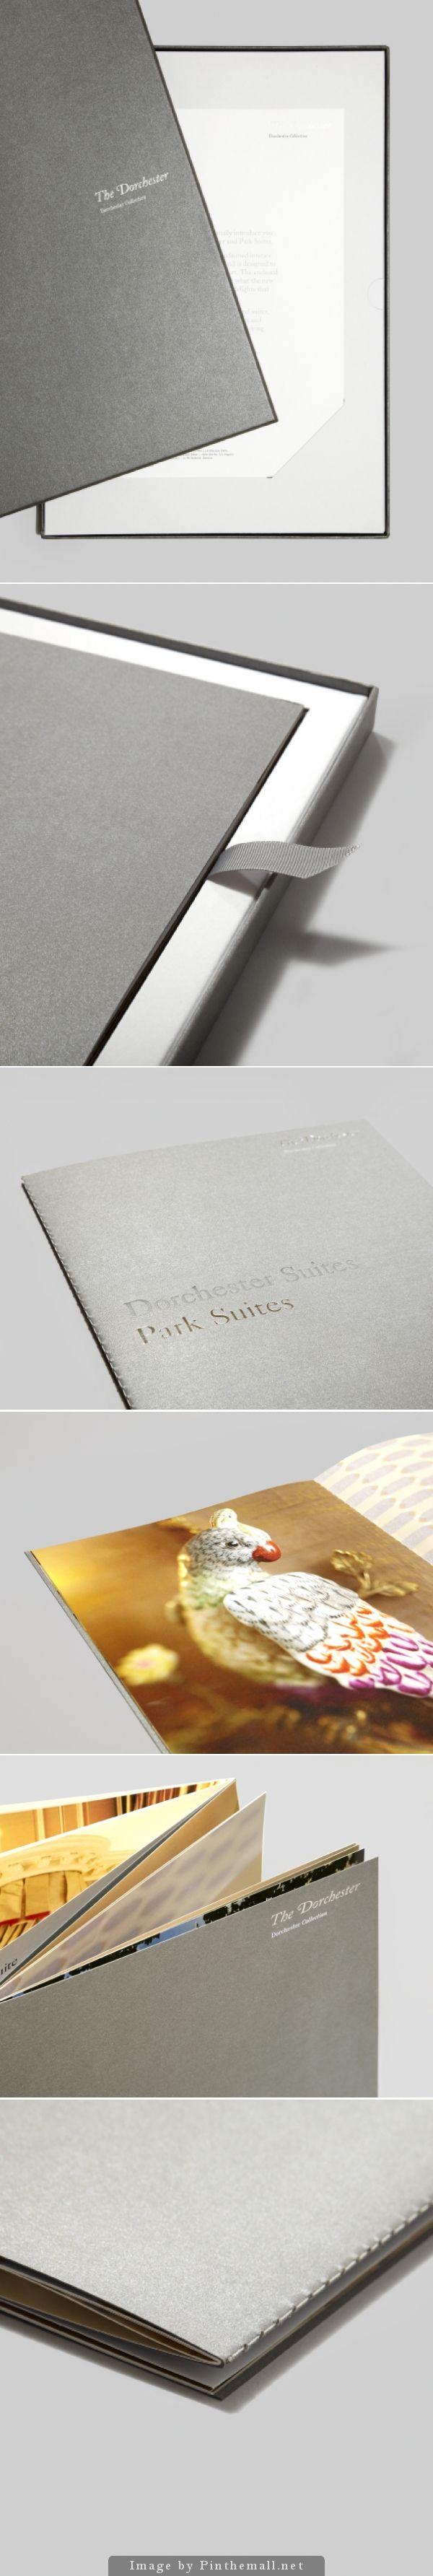 Dorchester Suites pack – Client: The Dorchester Designer: &Smith Year: 2012 Kind: Brochures Promotional pieces Size: Booklet: 345mm x 235mm